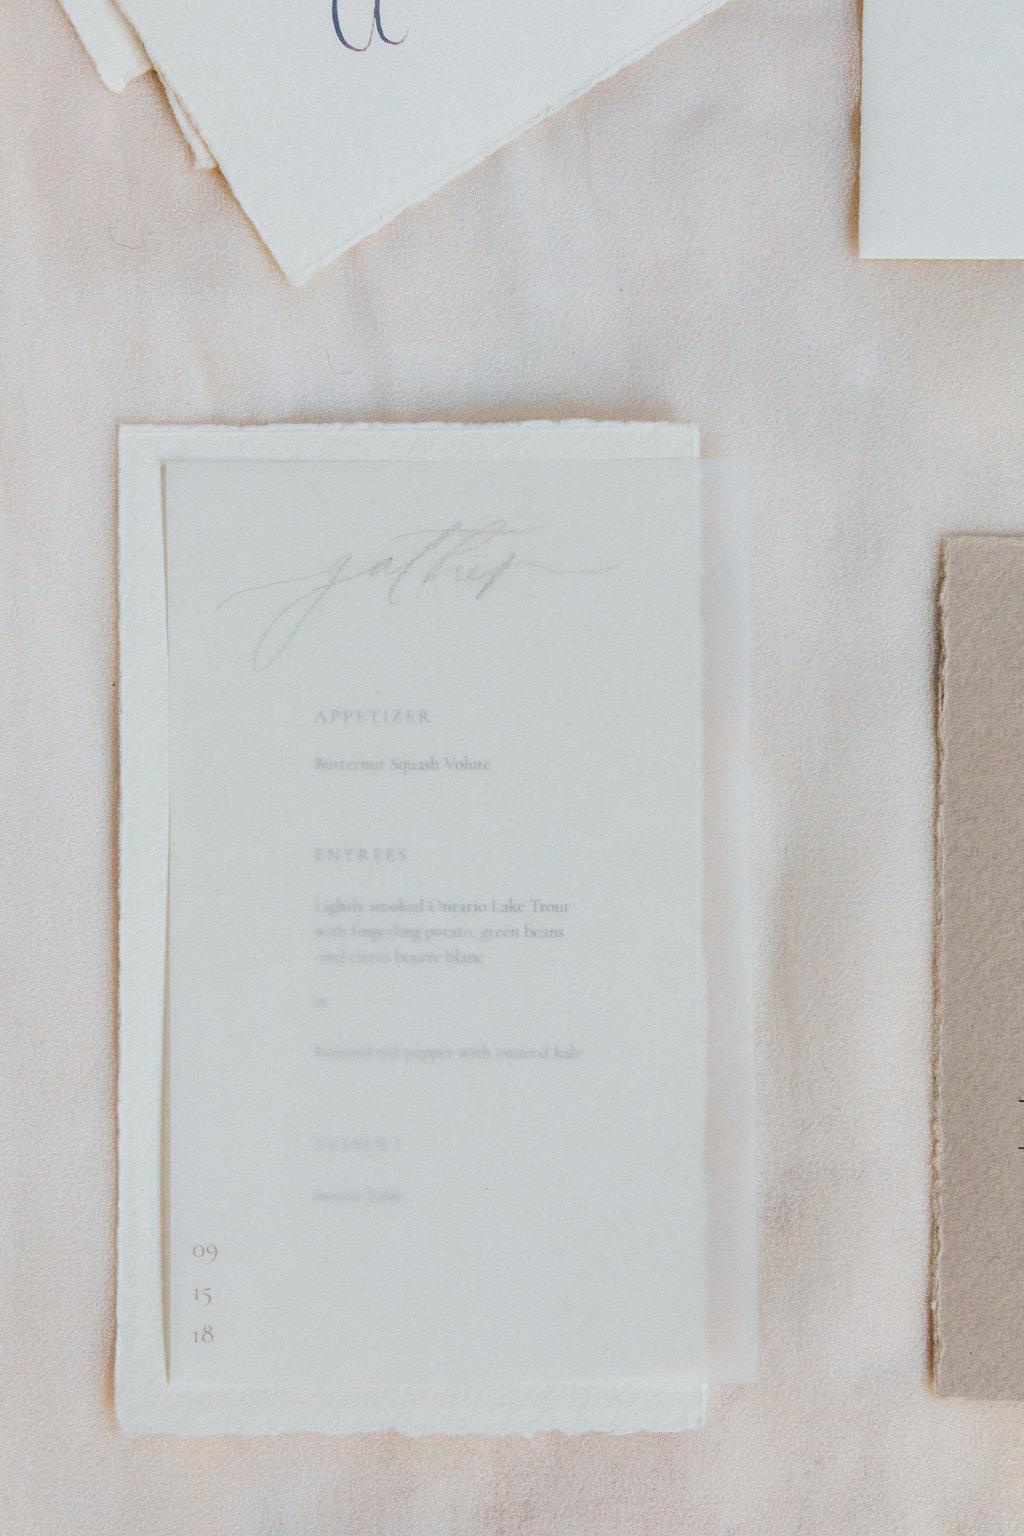 Blush-and-Bowties-Minimalist-Artisinal-Christine-Lim-016.JPG